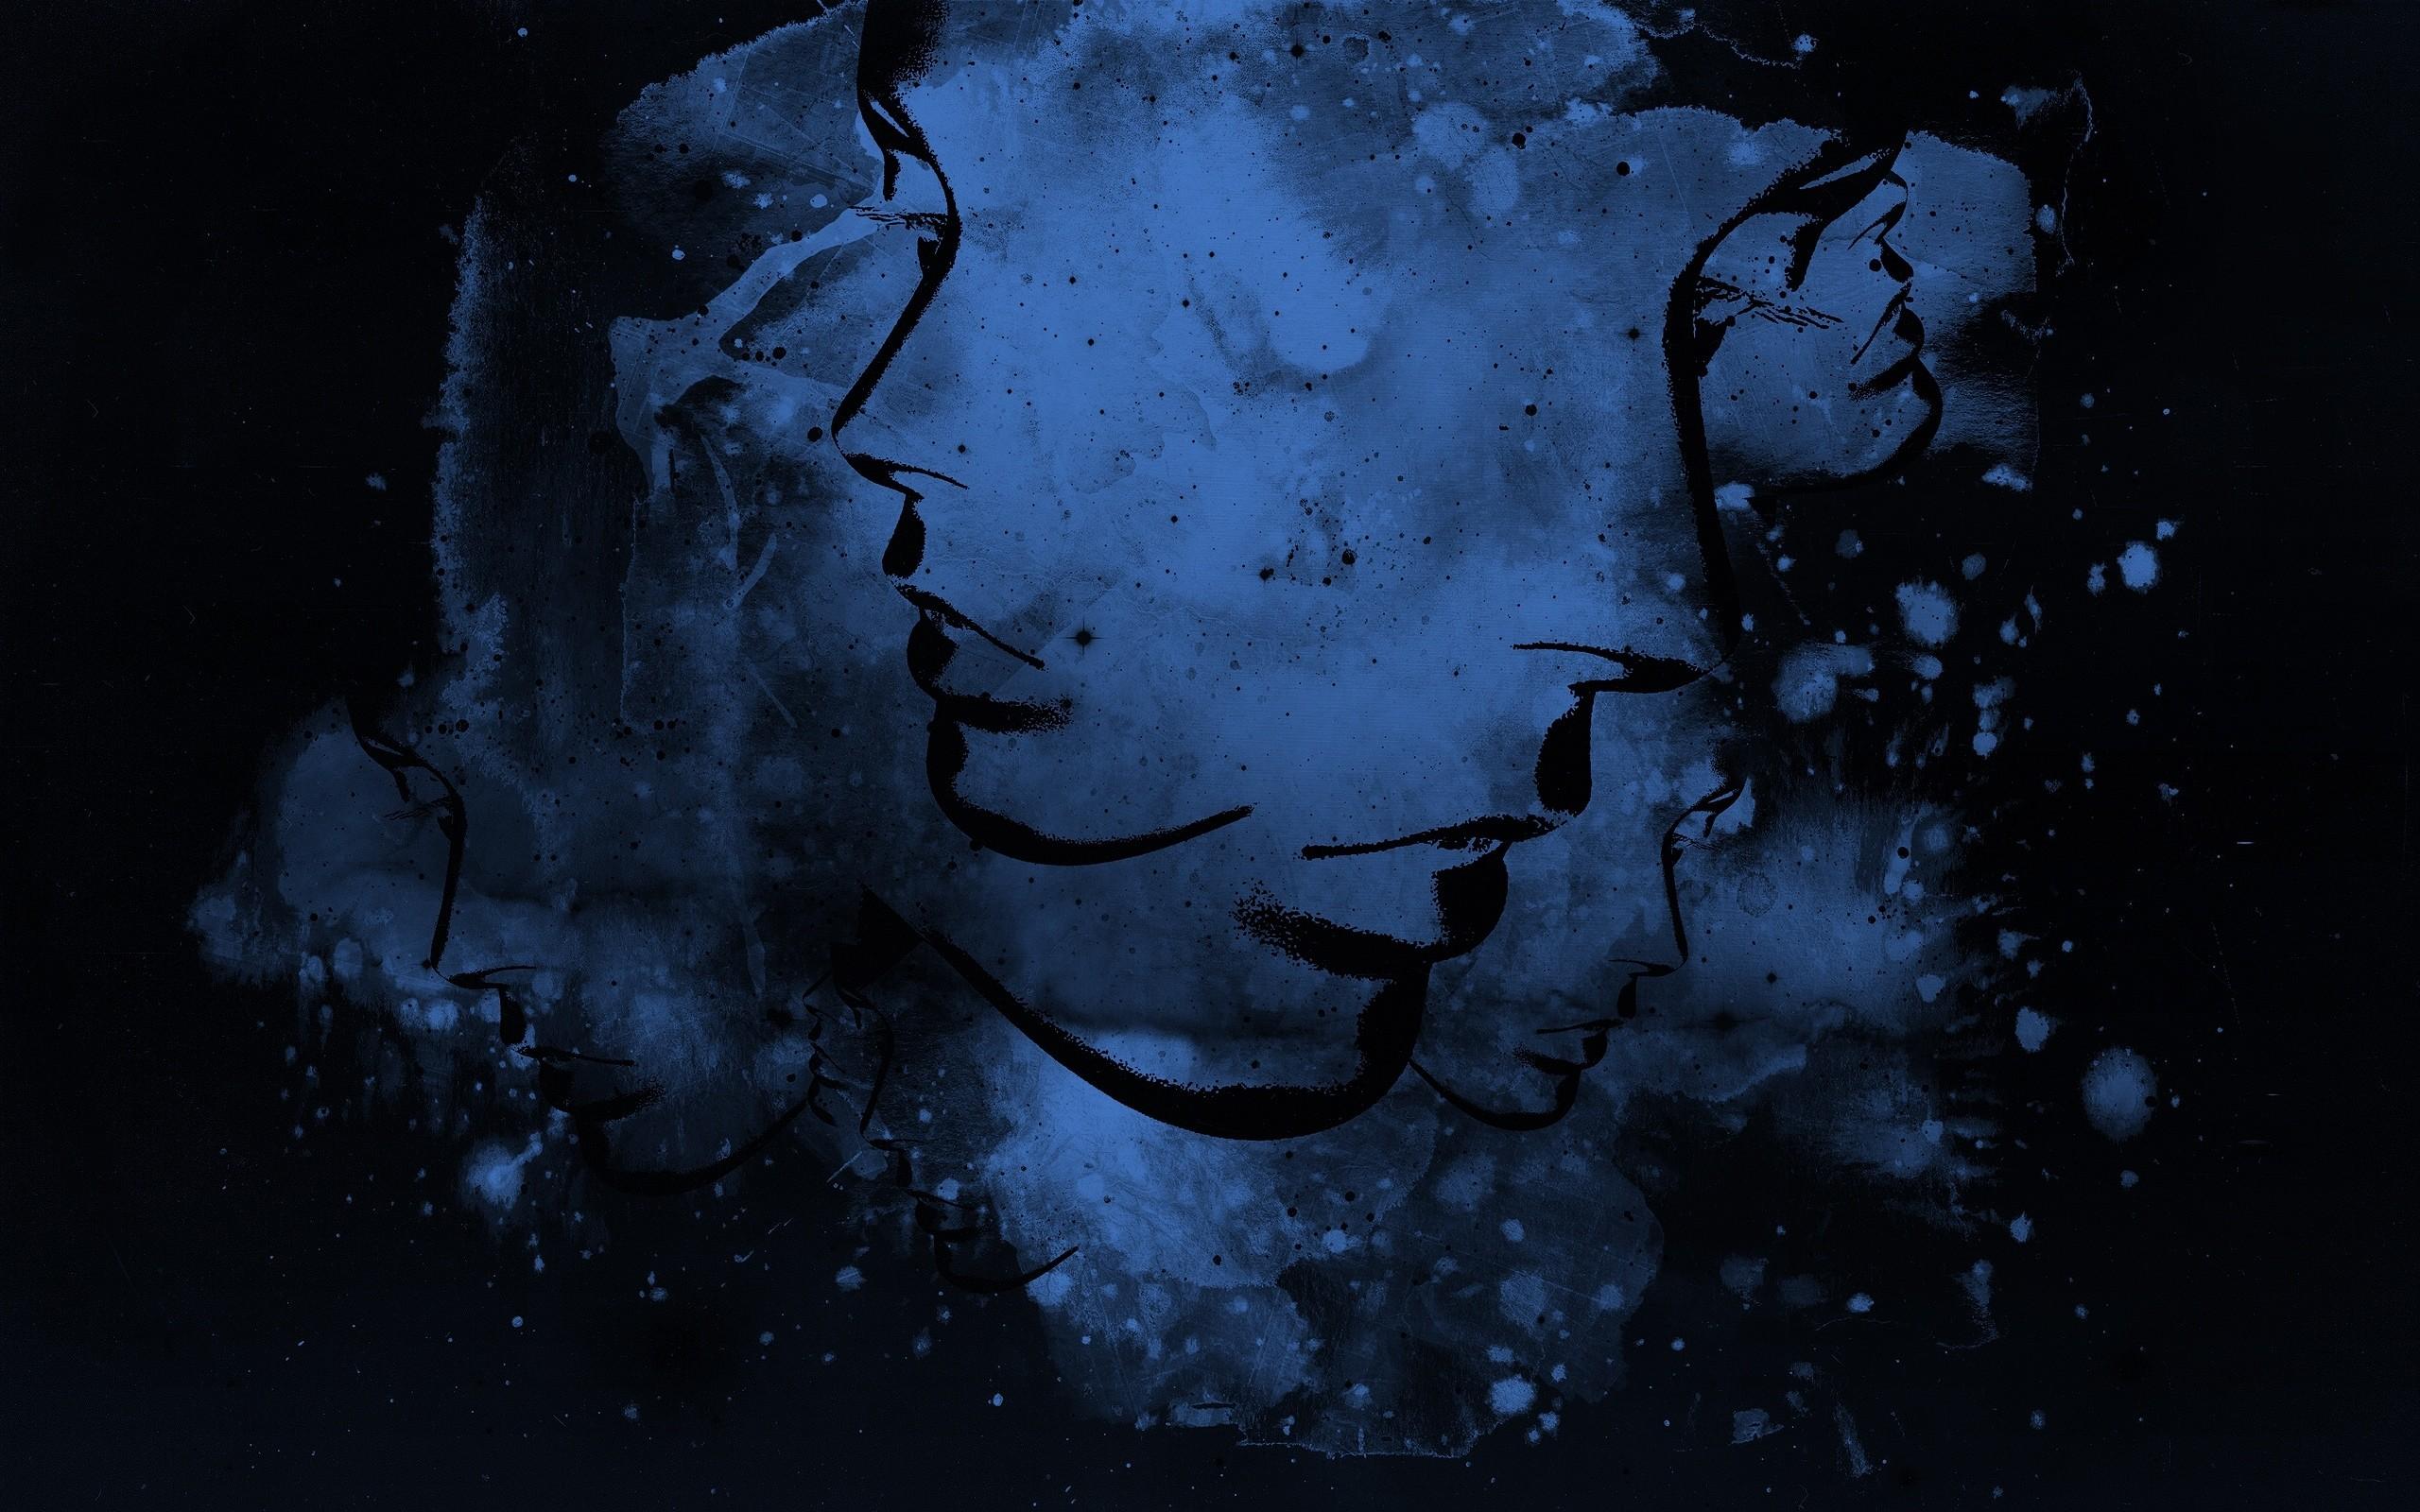 Wallpaper Abstract, Blue, Black, Light